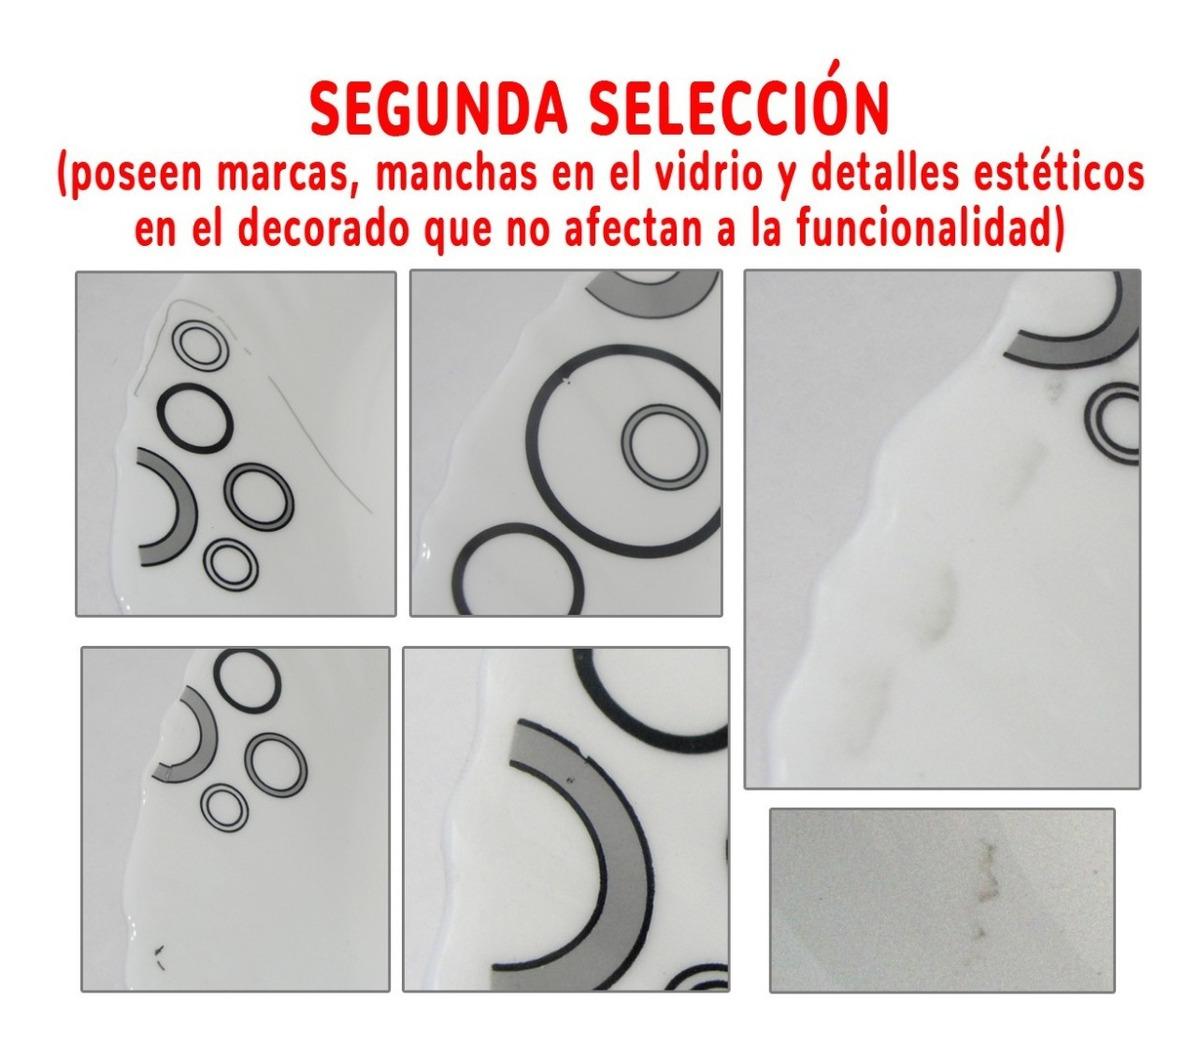 Set 20 Pz Vajilla Platos Vidrio Blanc Deco Circulo 2da Selec